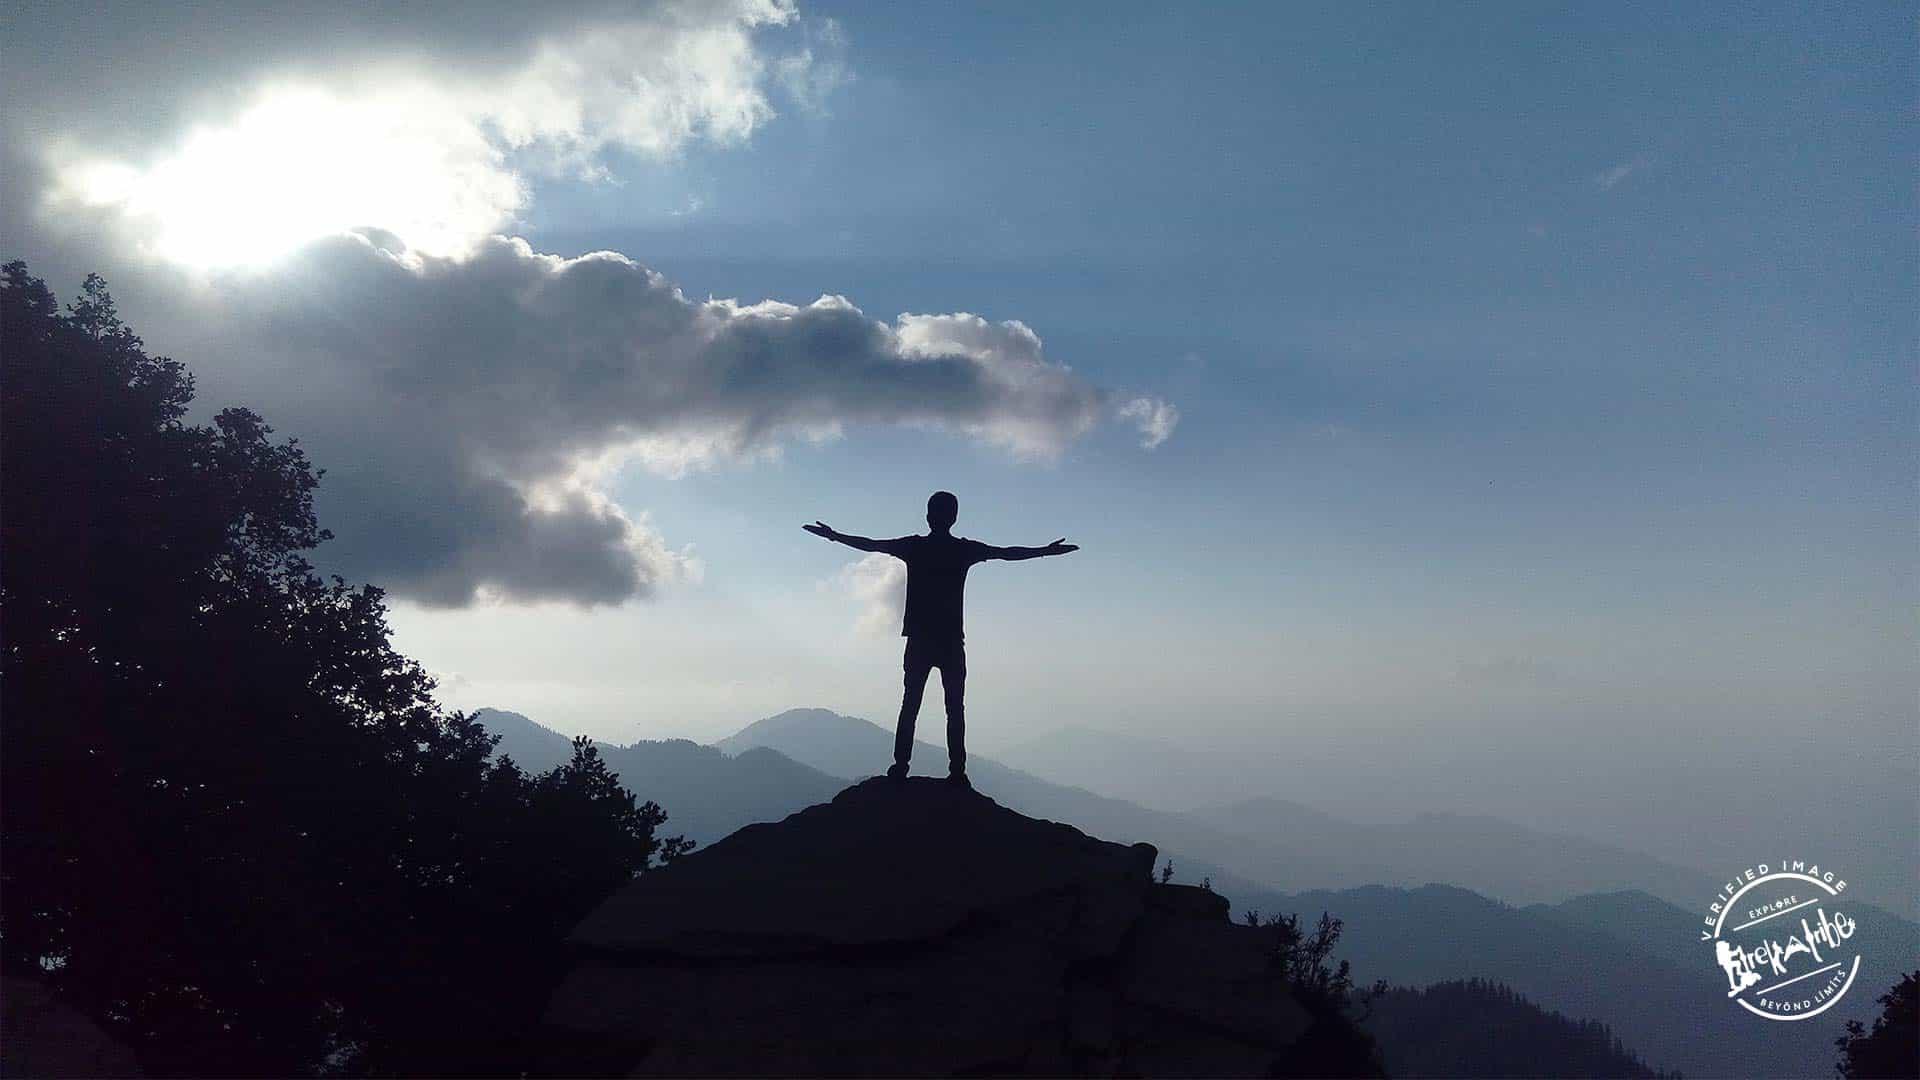 Hatu Peak Trekking - Shimla , Himachal Pradesh